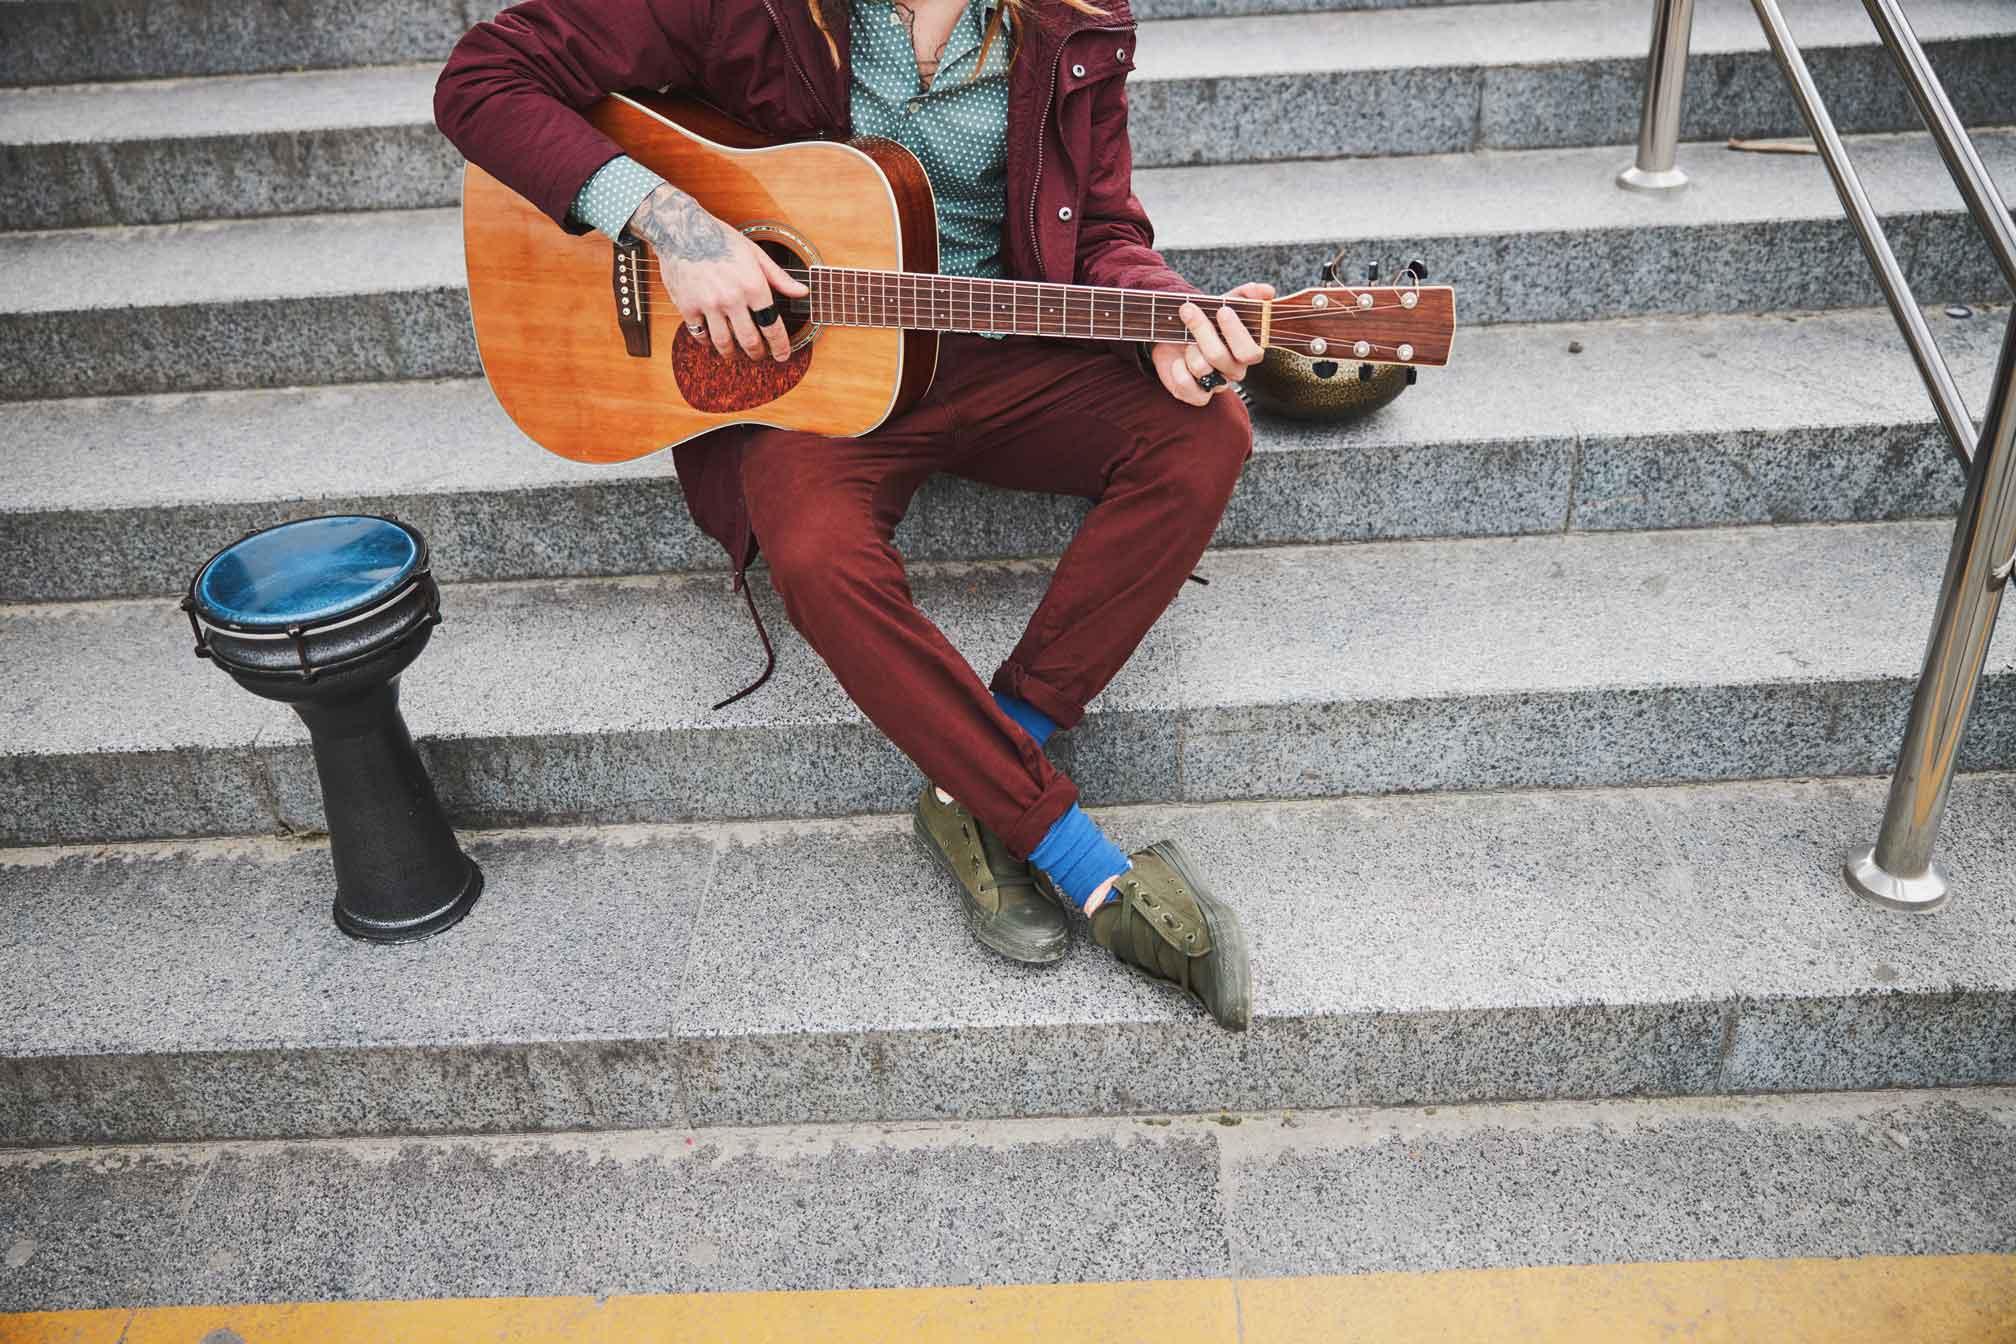 futuro digital para la música